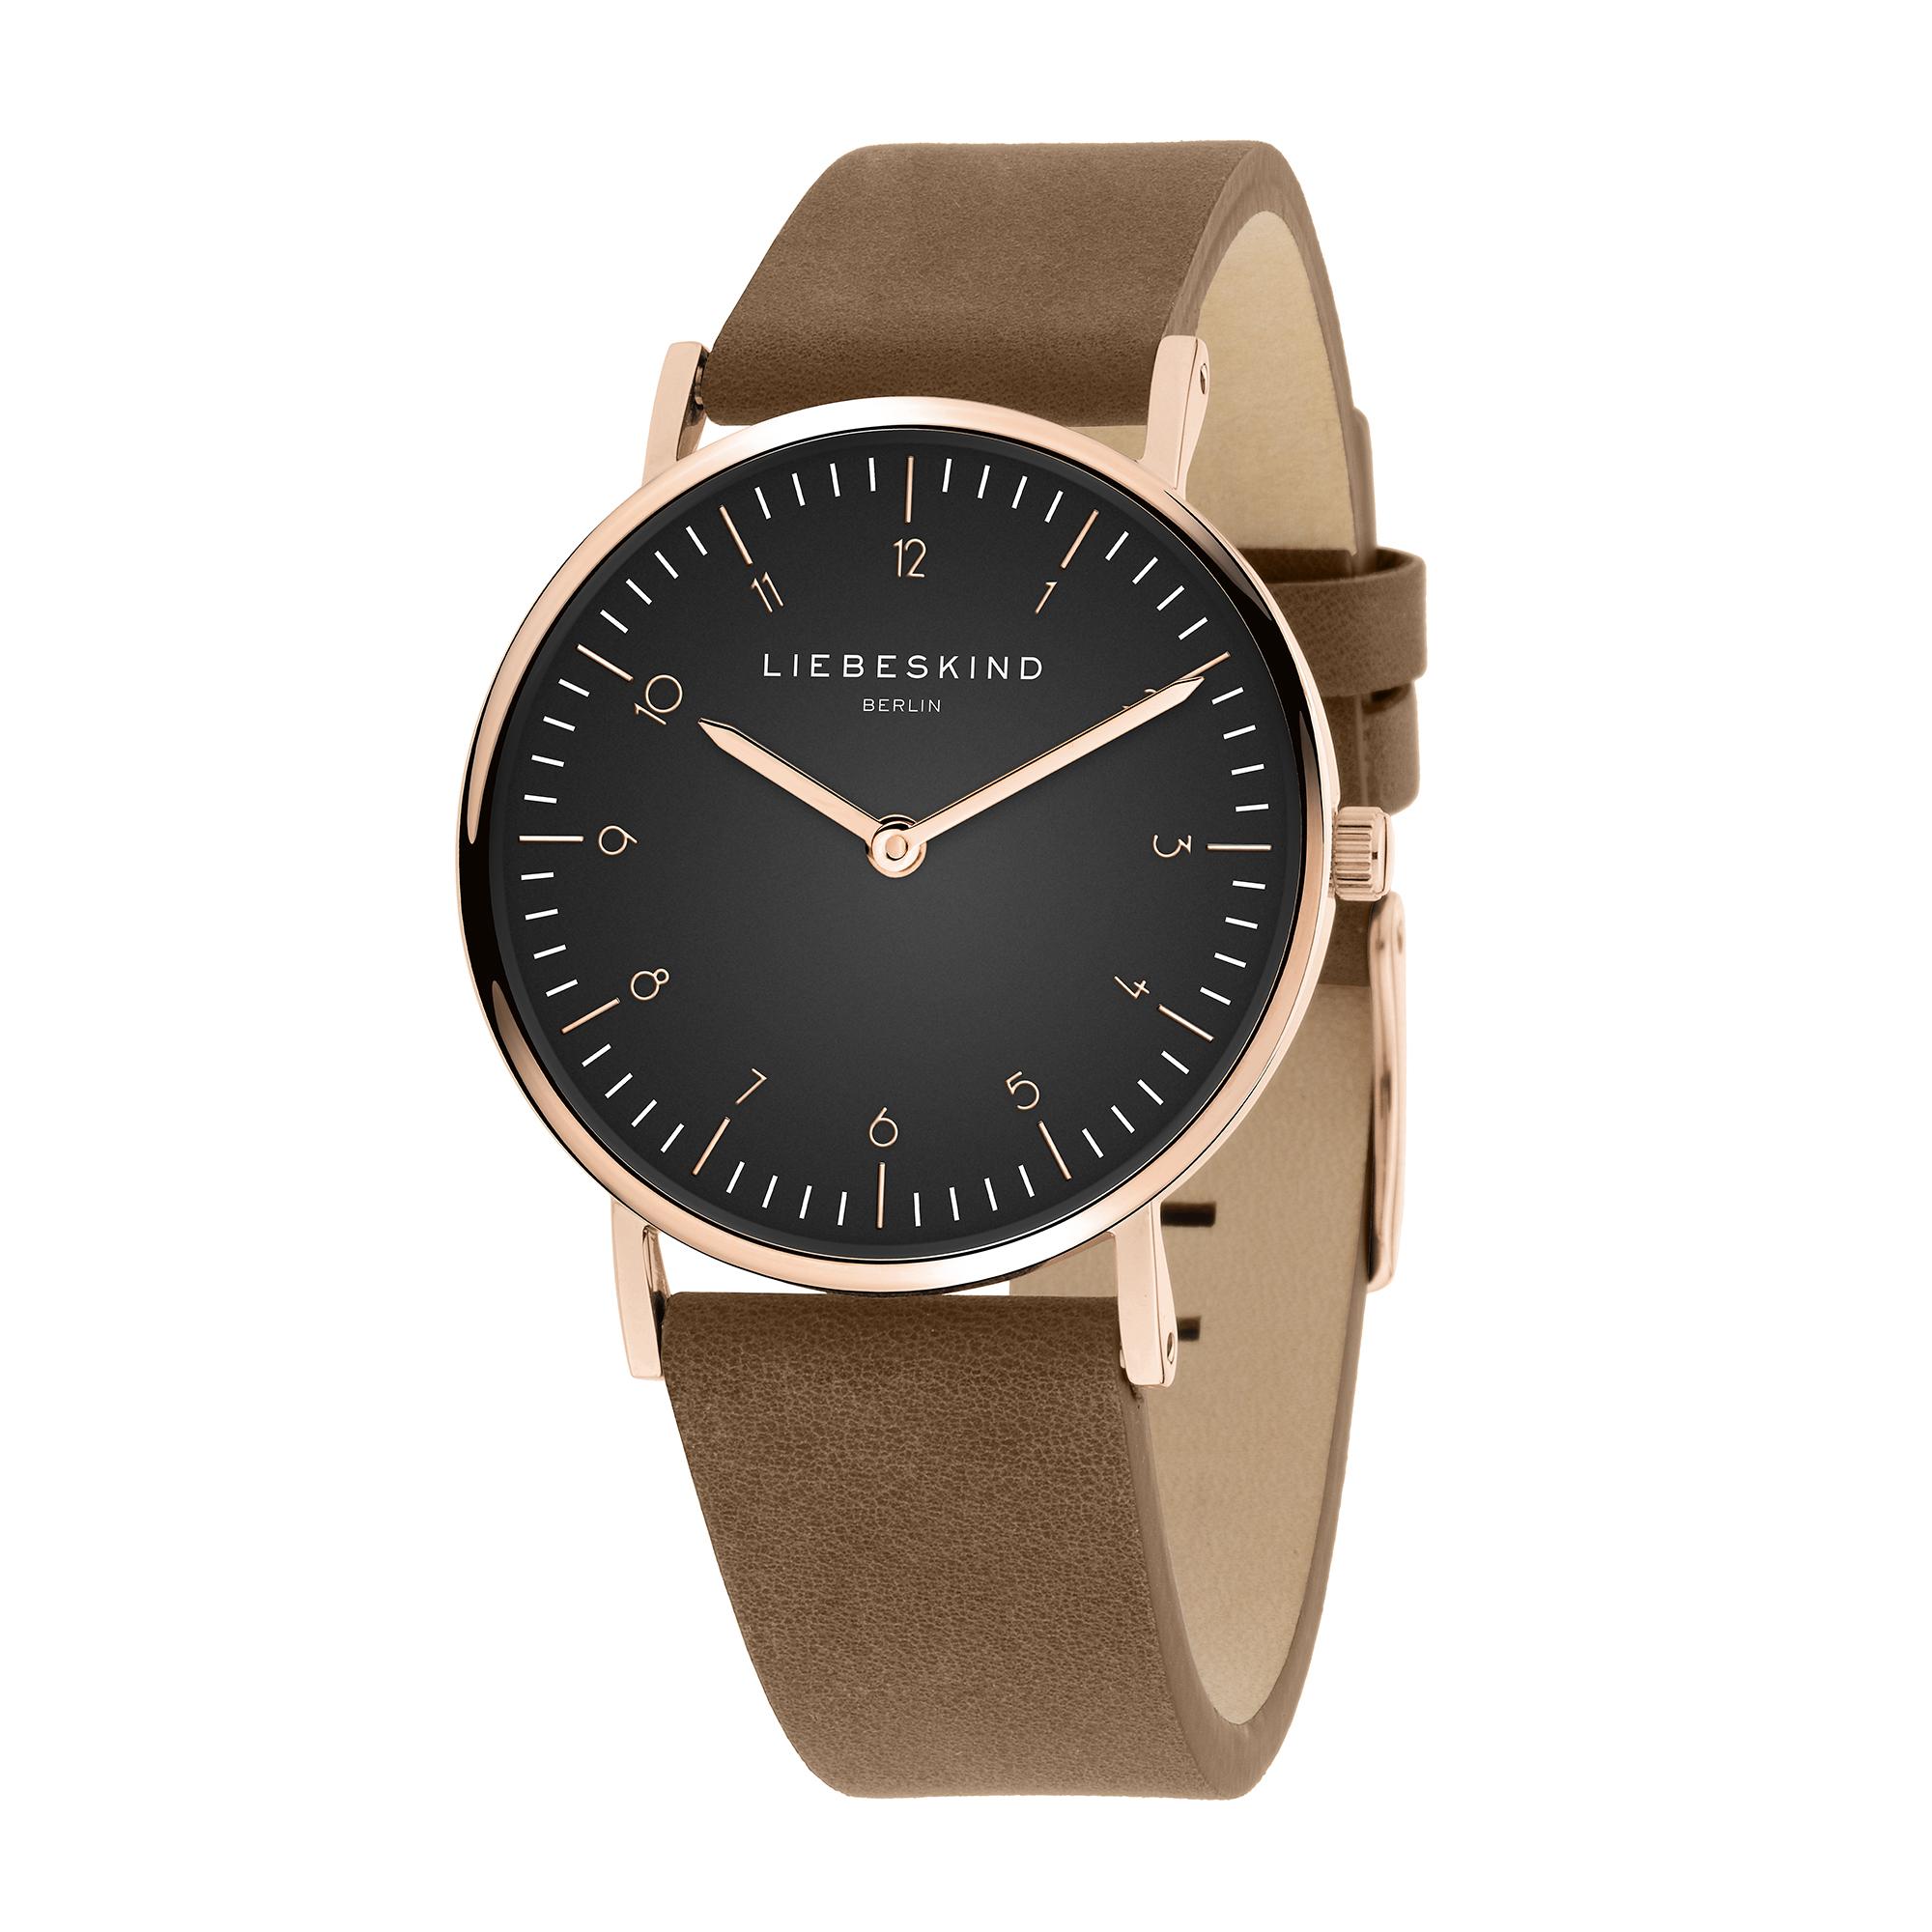 LIEBESKIND BERLIN Damen Uhr Armbanduhr Leder LT-0162-LQ